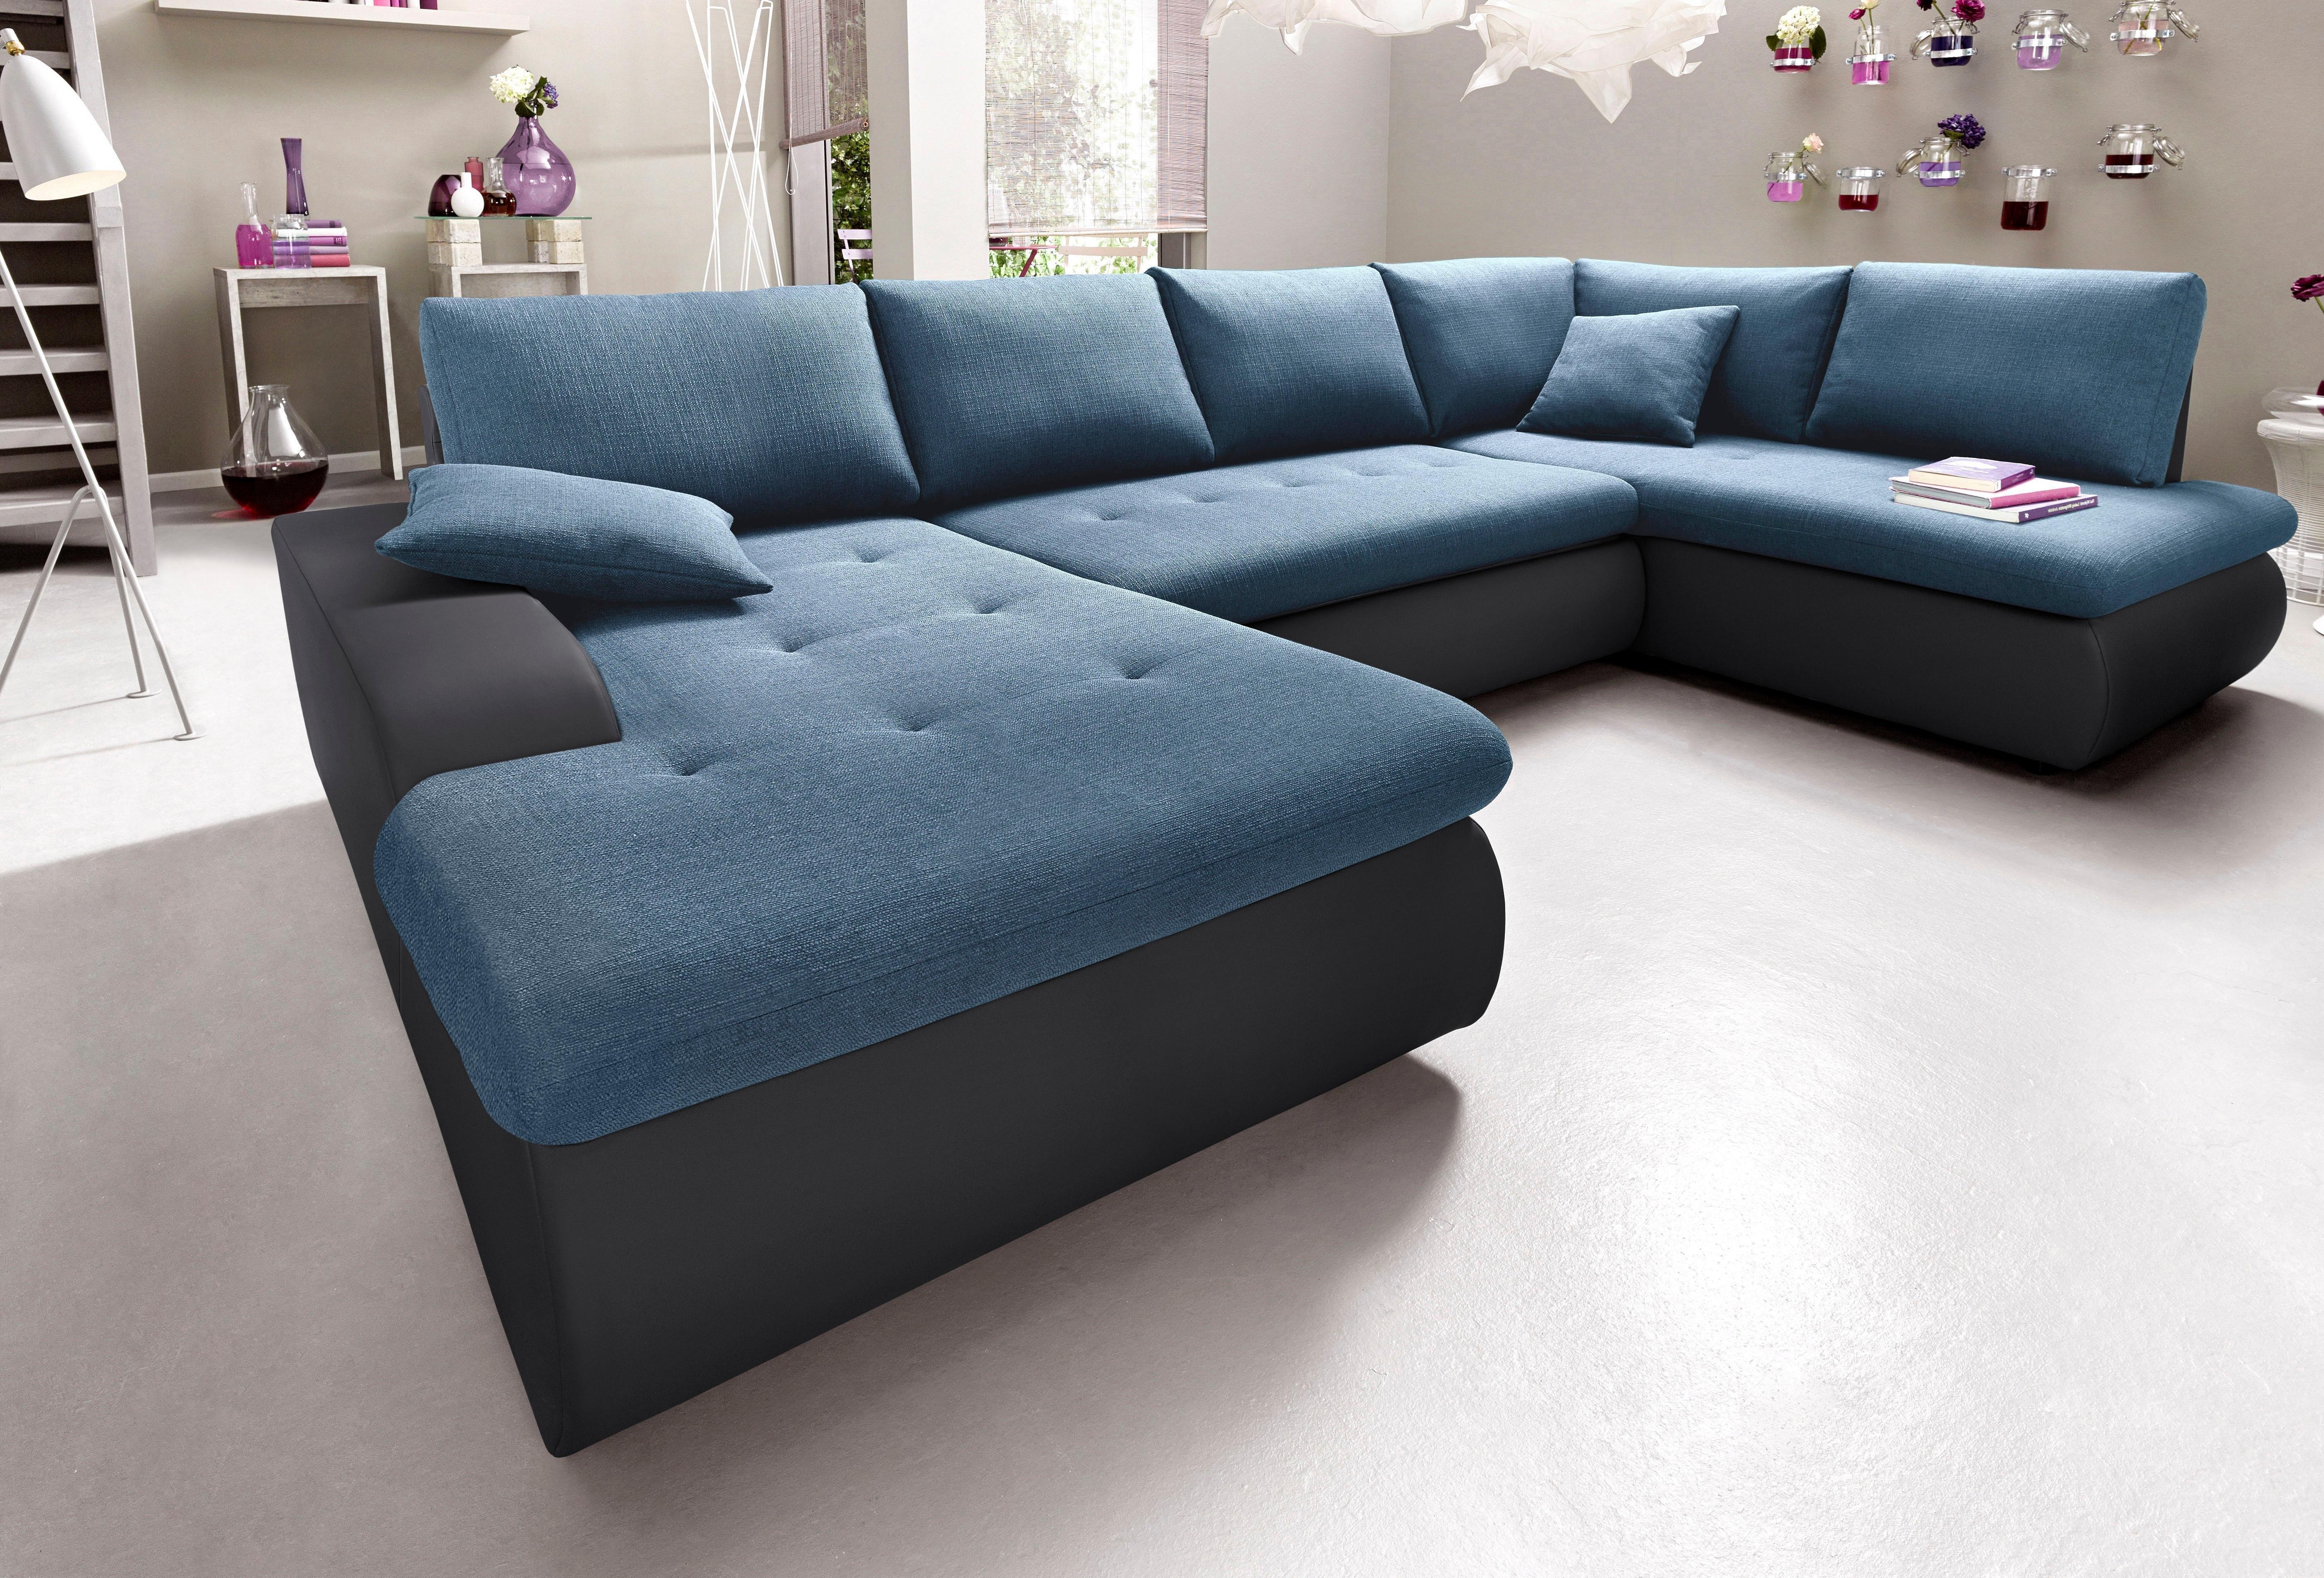 goedkope hoekbank kopen affordable goedkope banken outlet mooie bankstellen outlet goedkope. Black Bedroom Furniture Sets. Home Design Ideas